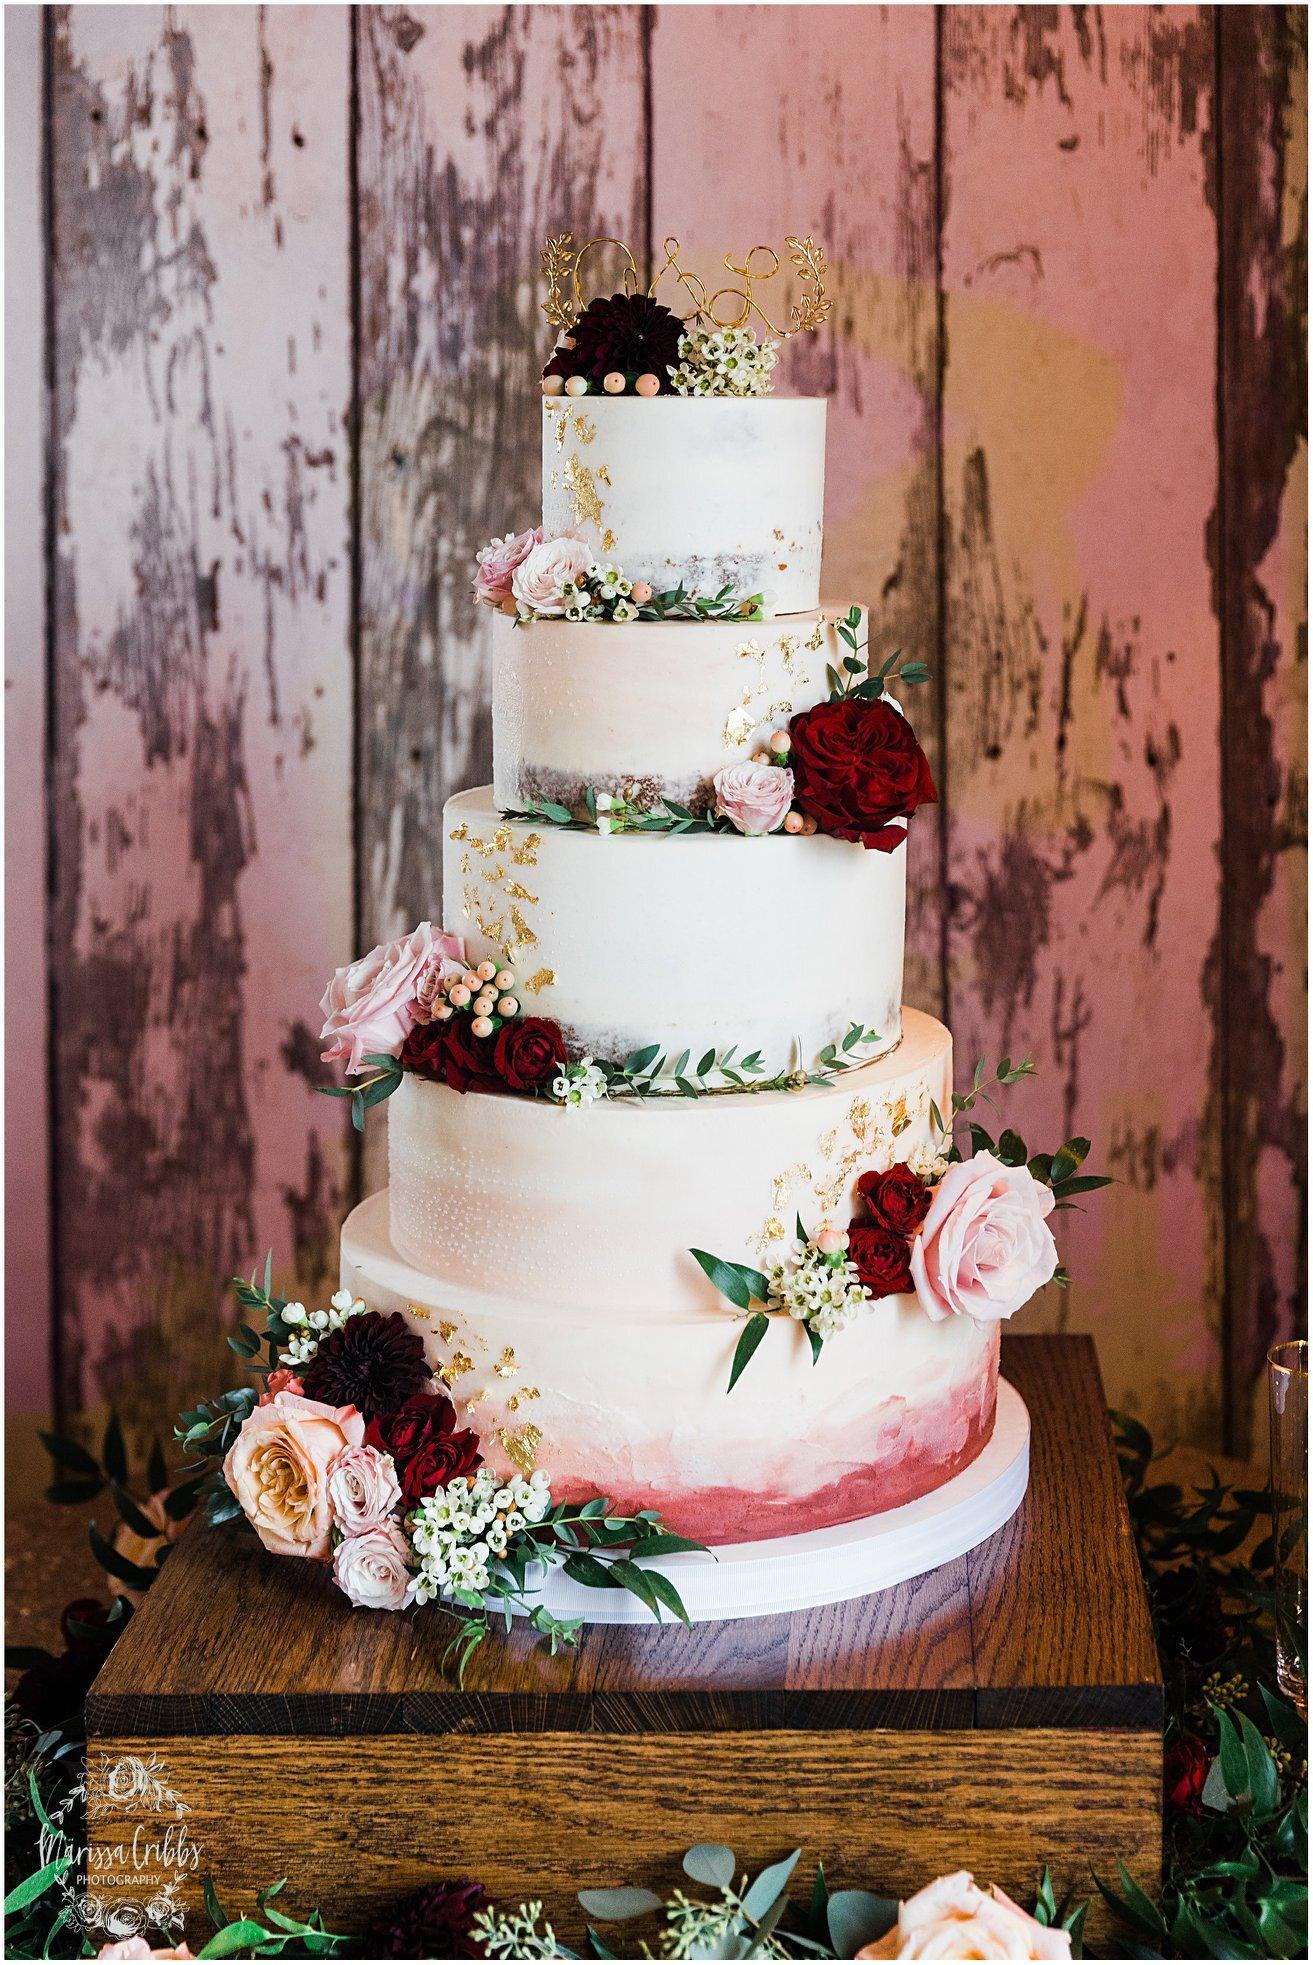 Wedding Cake - Marrisa Cribbs Photography